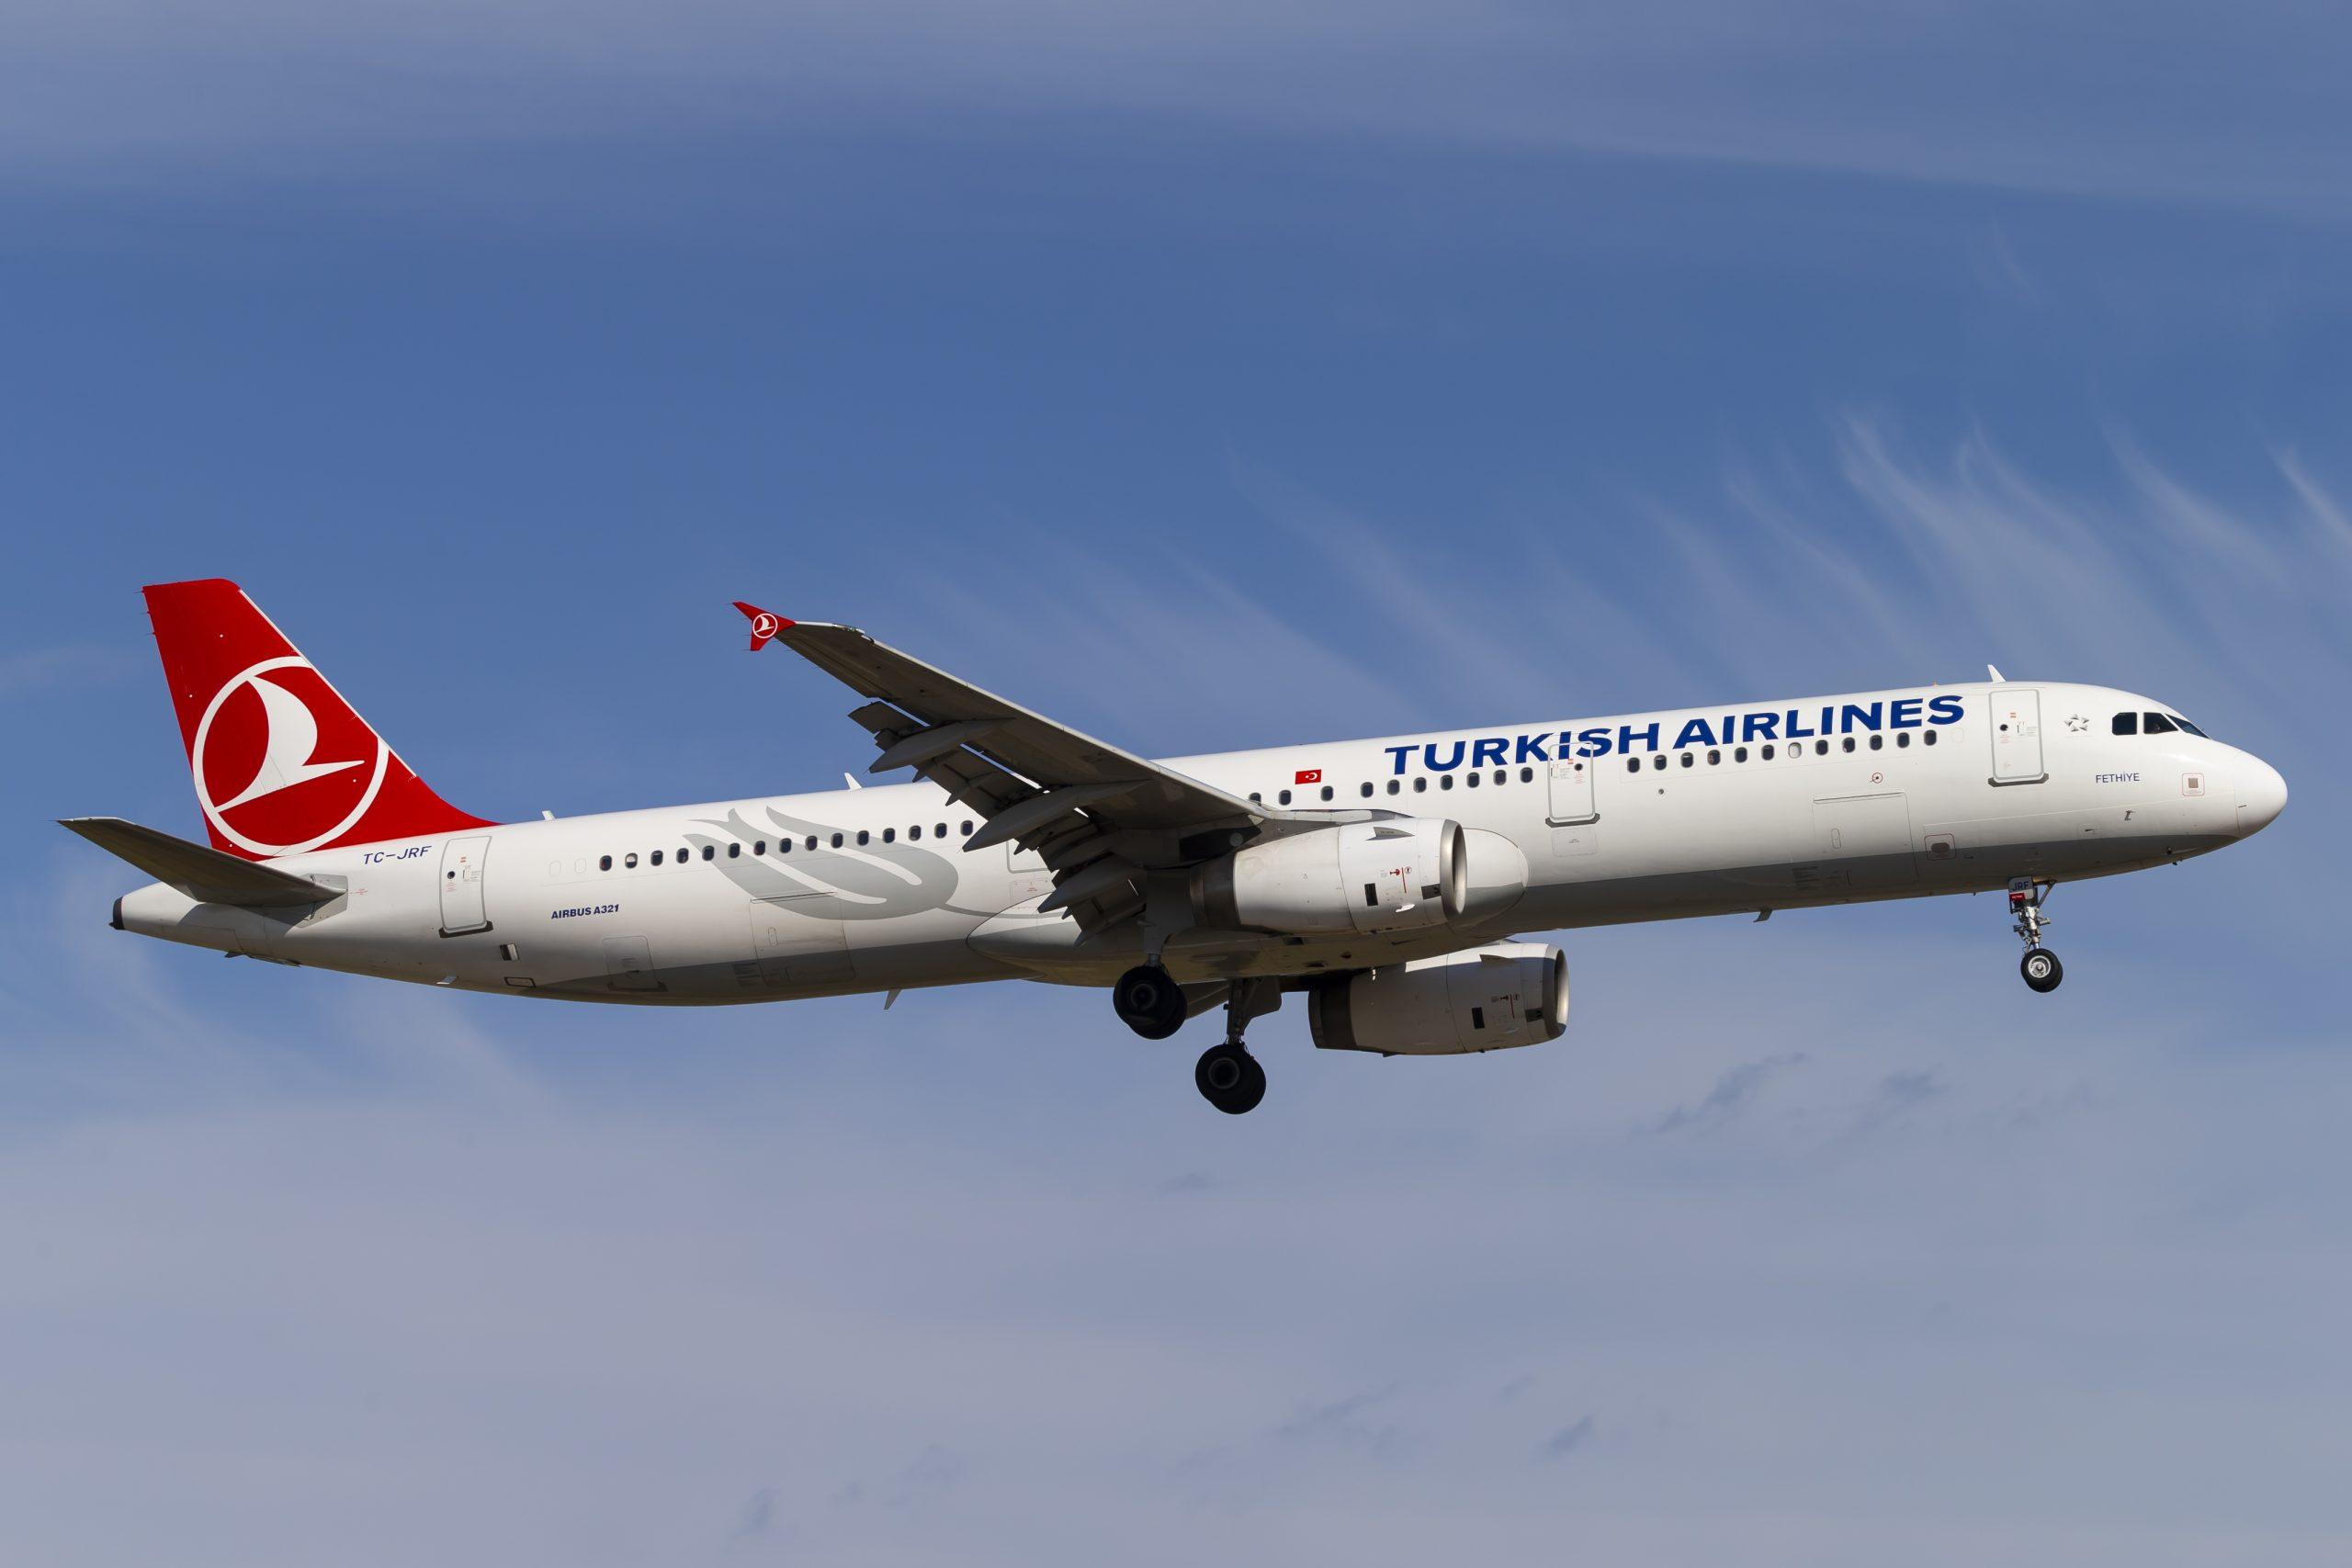 En Airbus A321-200 fra Turkish Airlines. (Foto: © Thorbjørn Brunander Sund, Danish Aviation Photo)